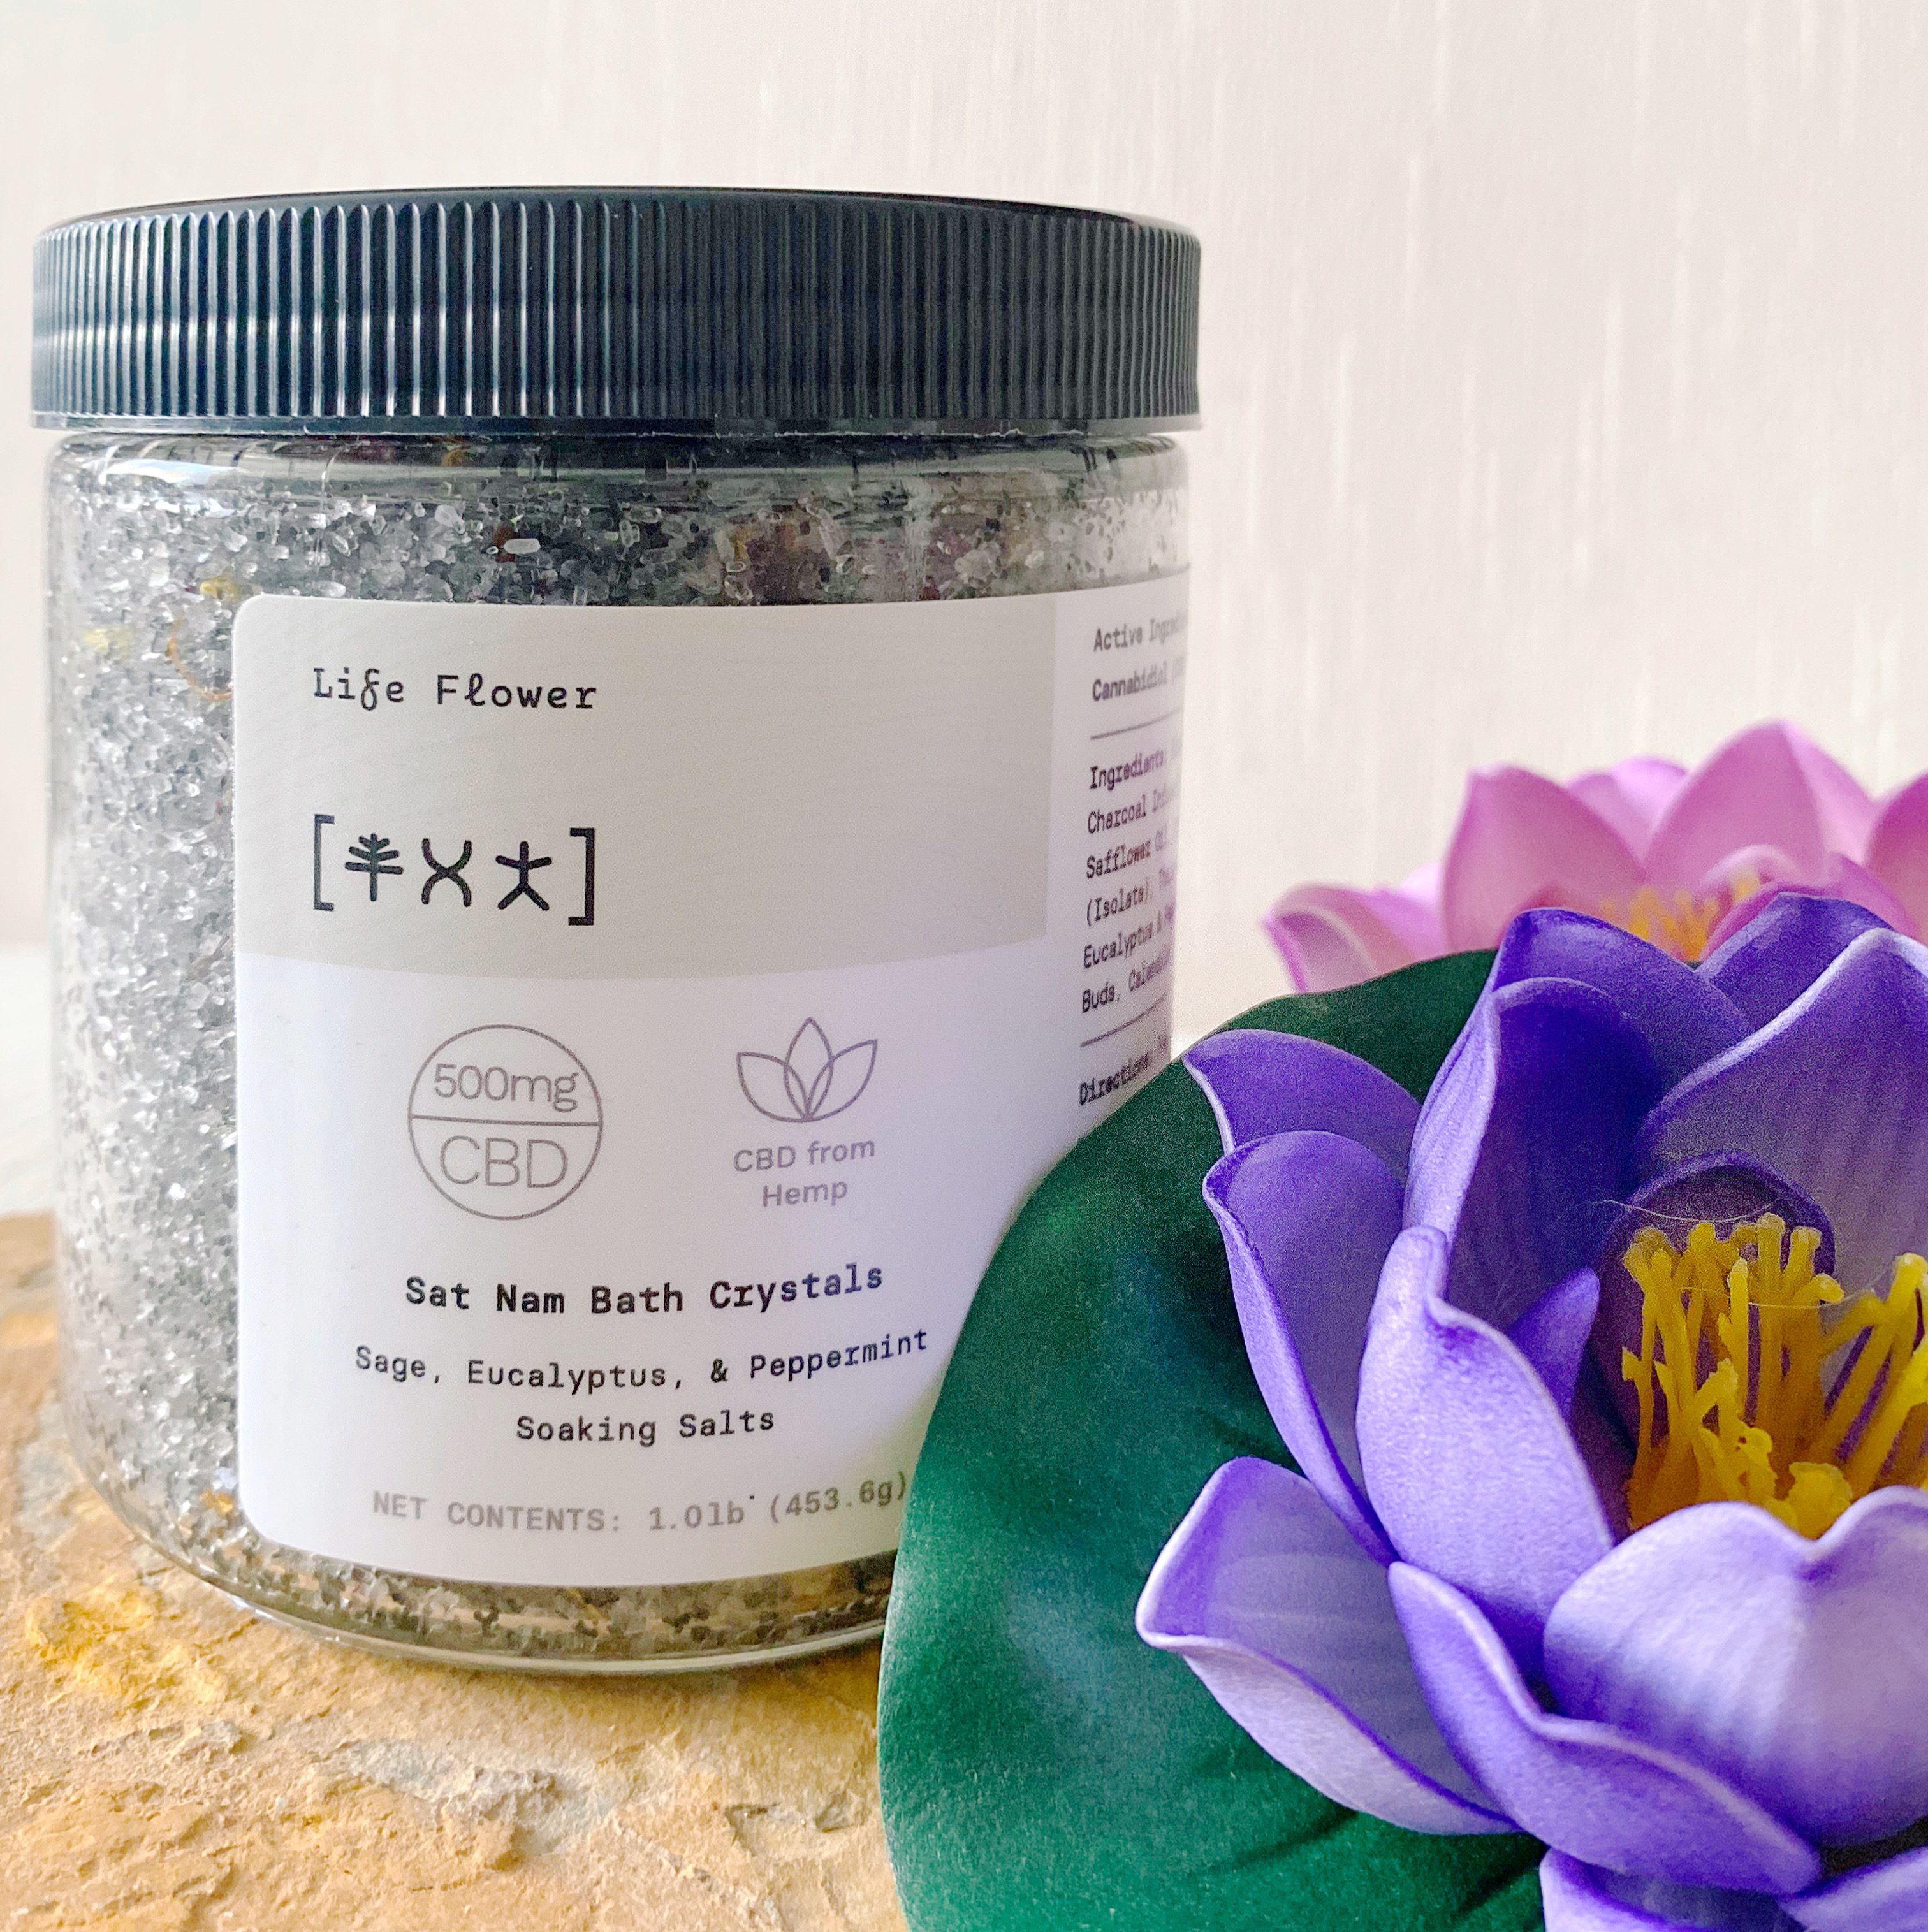 Sat Nam Bath Crystals | Sage, Eucalyptus, Peppermint